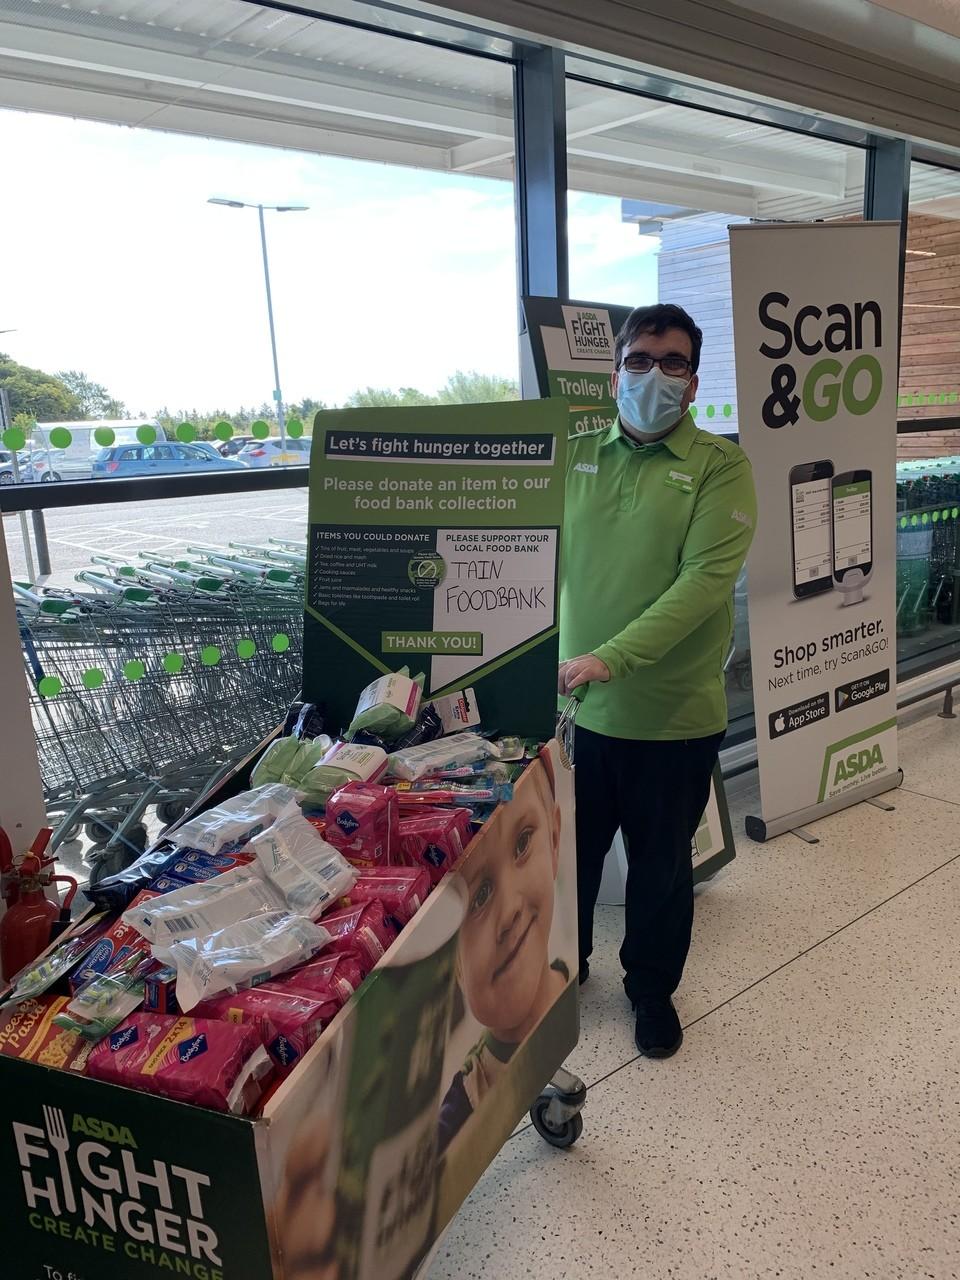 Foodbank support | Asda Tain